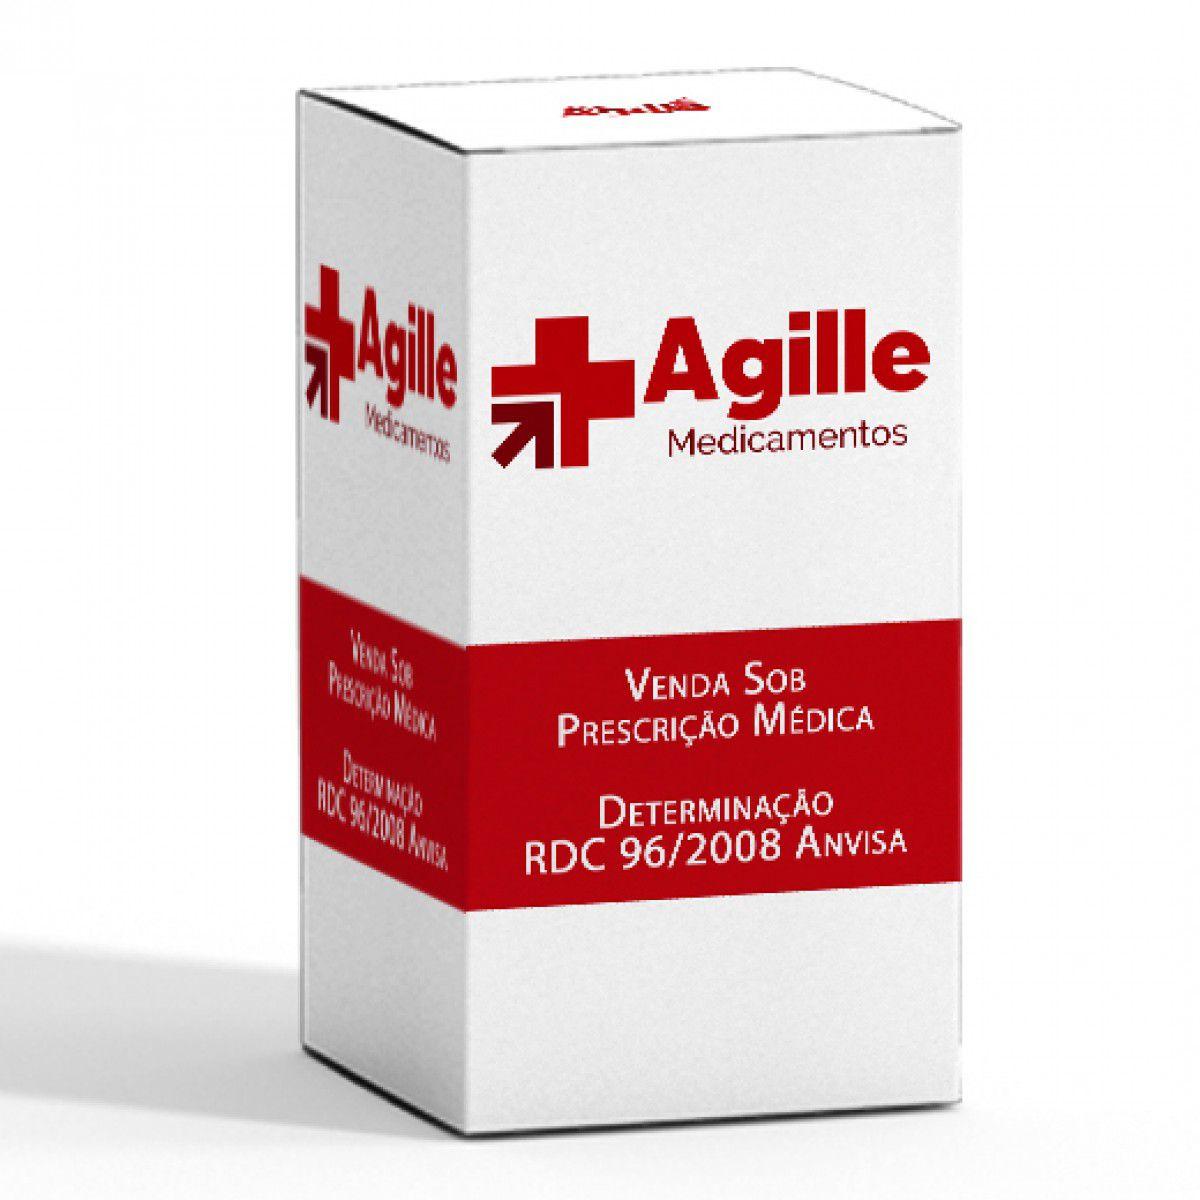 MICOFENOLATO DE MOFETILA 500MG (C/50 CP) G  - Agille Speciality